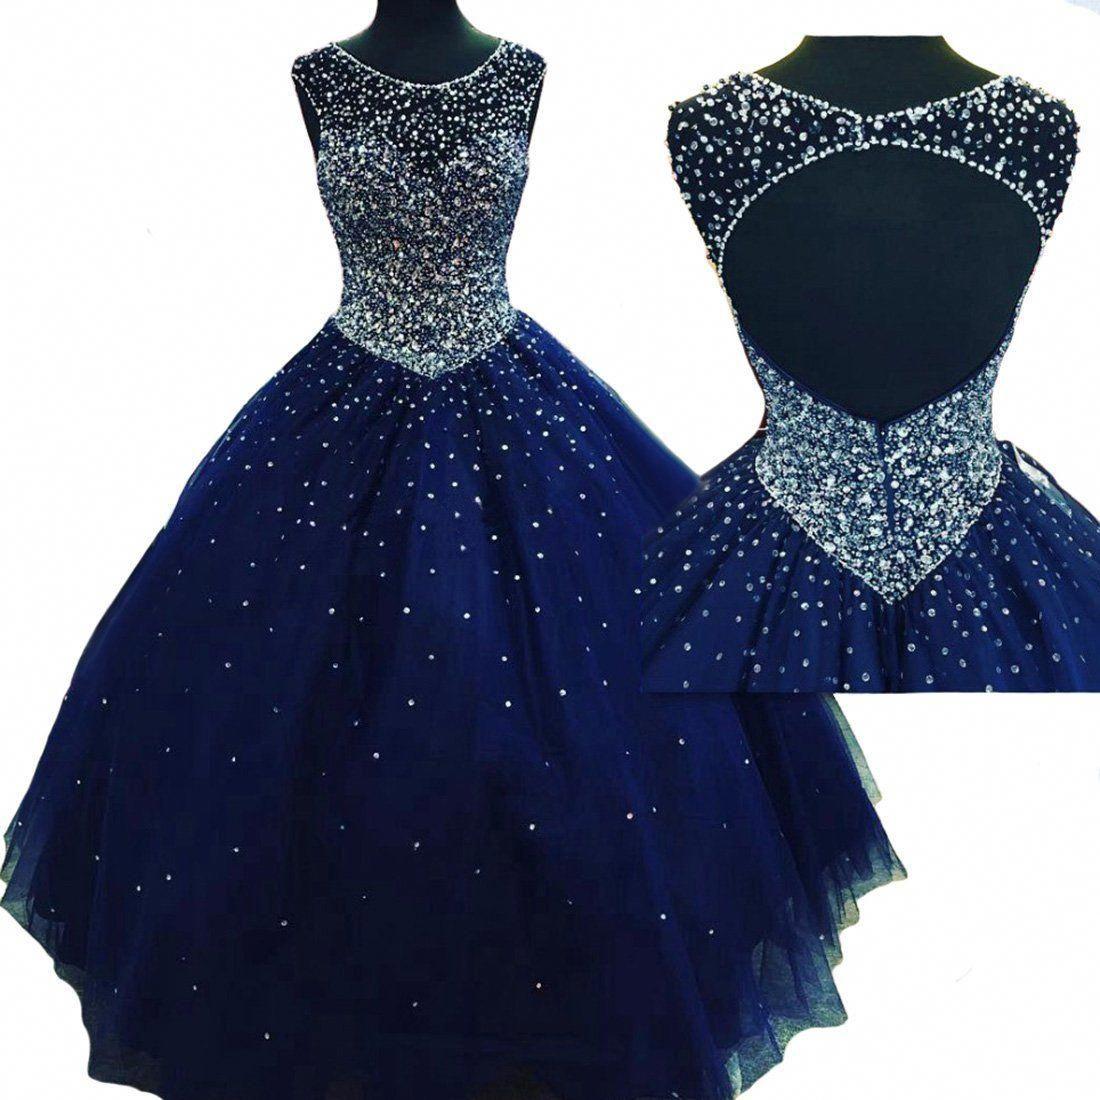 Competent Quinceanera Ideas Look At Here Quinceanera Dresses Blue Sweet Sixteen Dresses Quincenera Dresses [ 1100 x 1100 Pixel ]